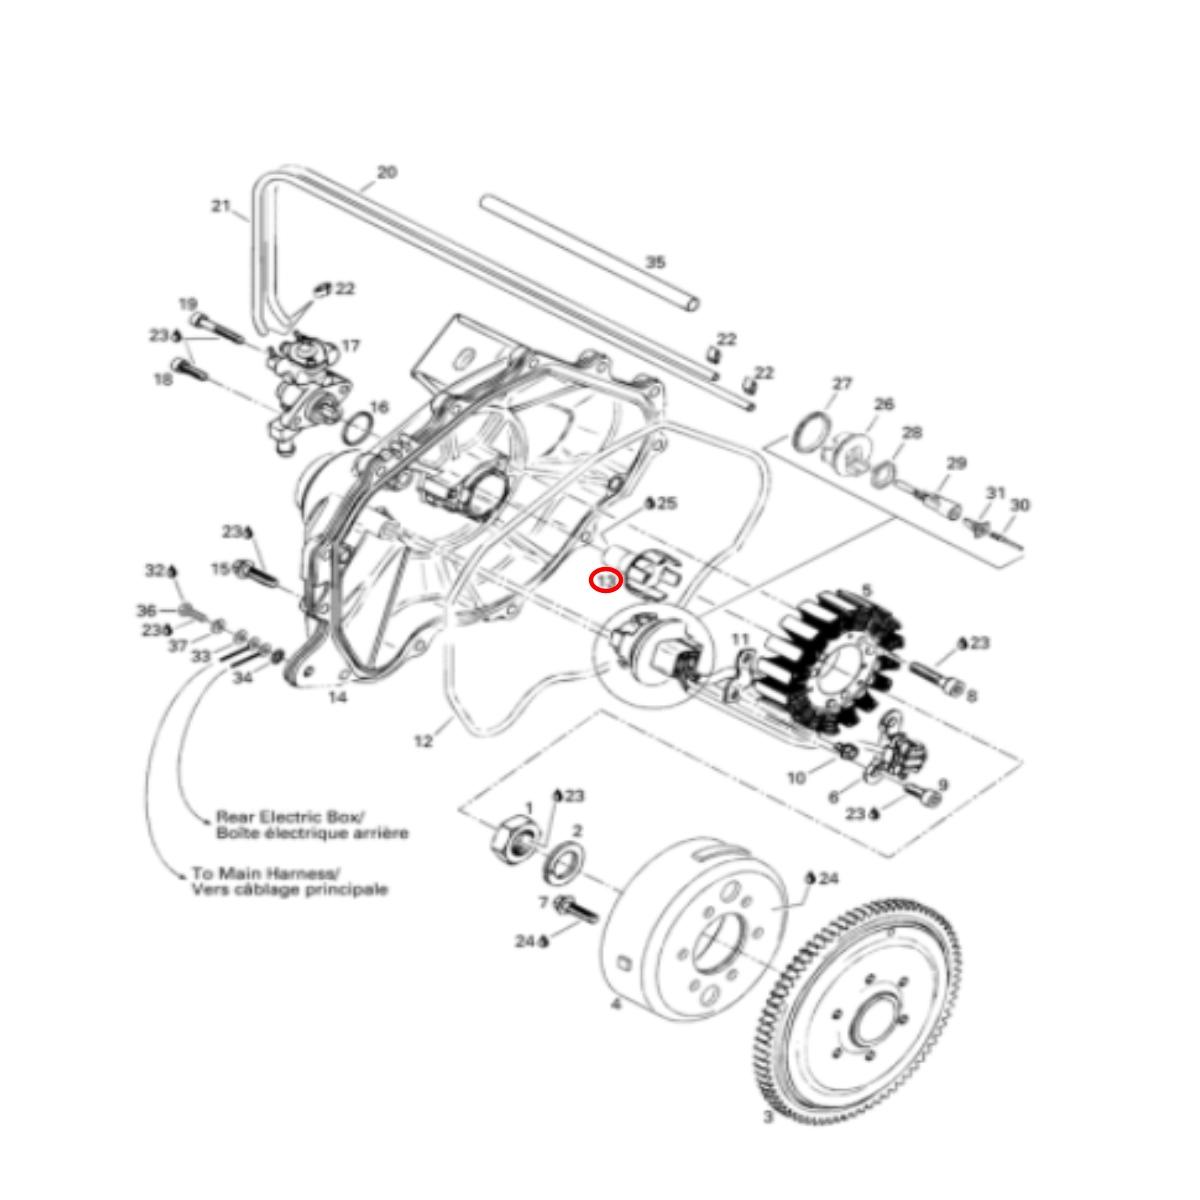 Eixo Bomba Óleo para Jet Ski Sea Doo 950  - Radical Peças - Peças para Jet Ski